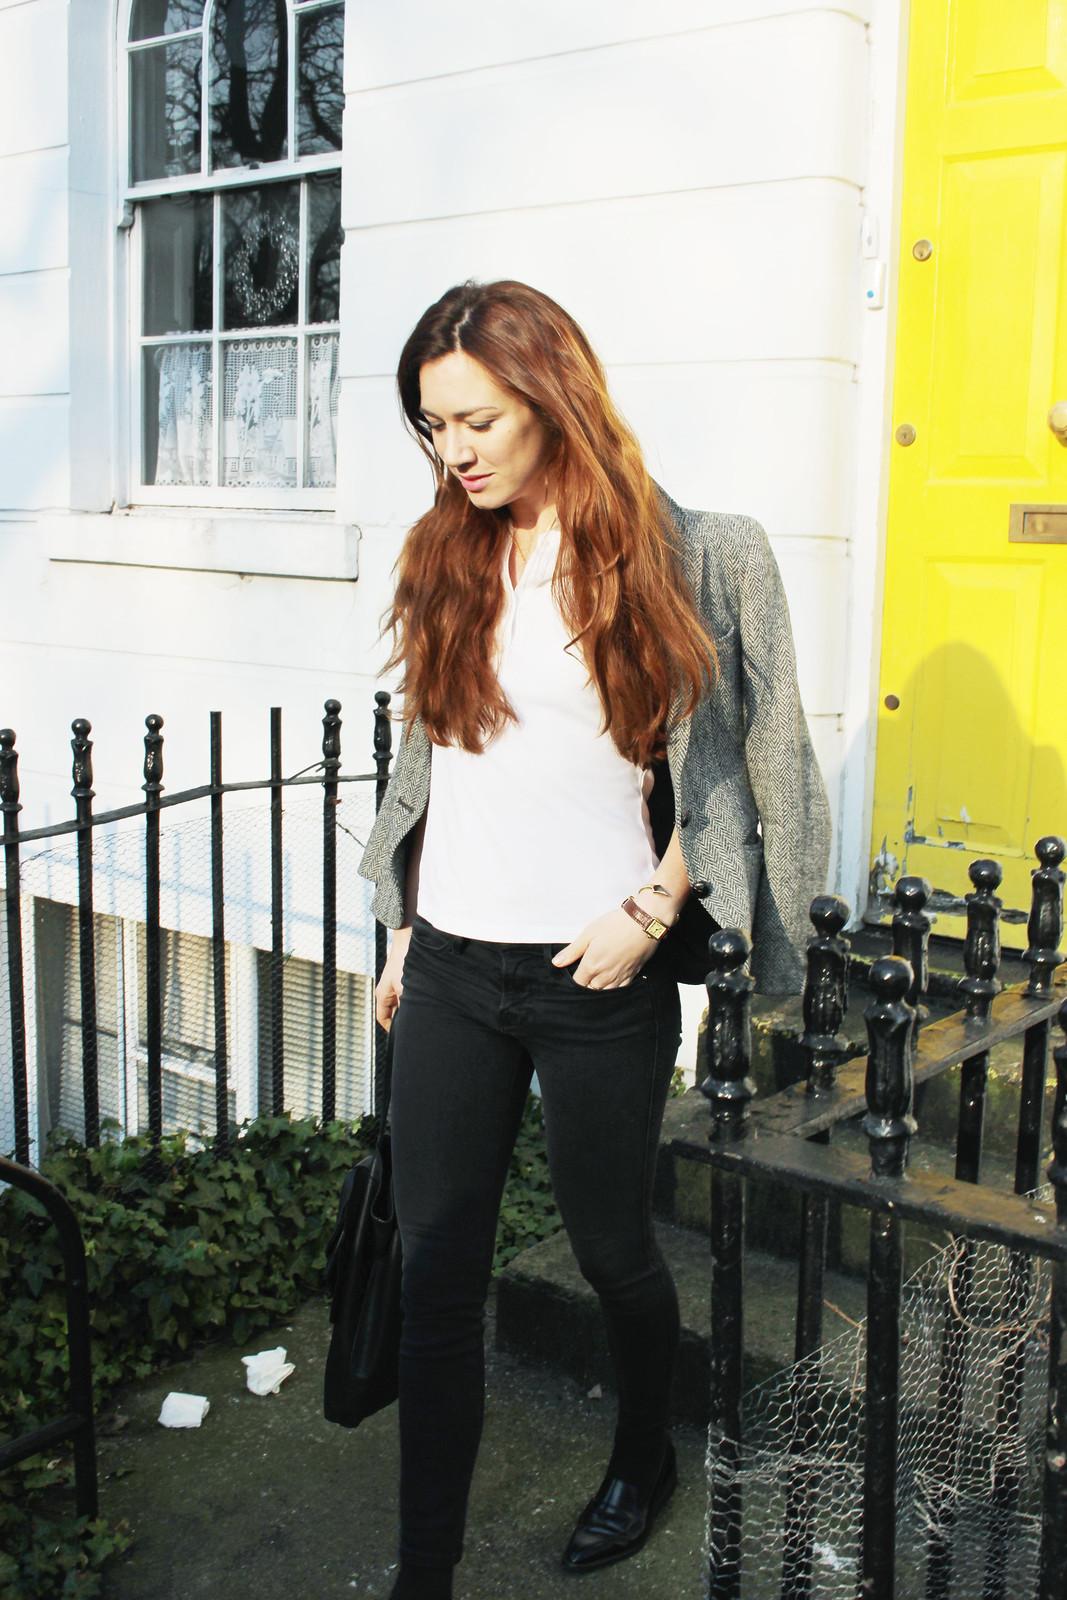 London March 2013